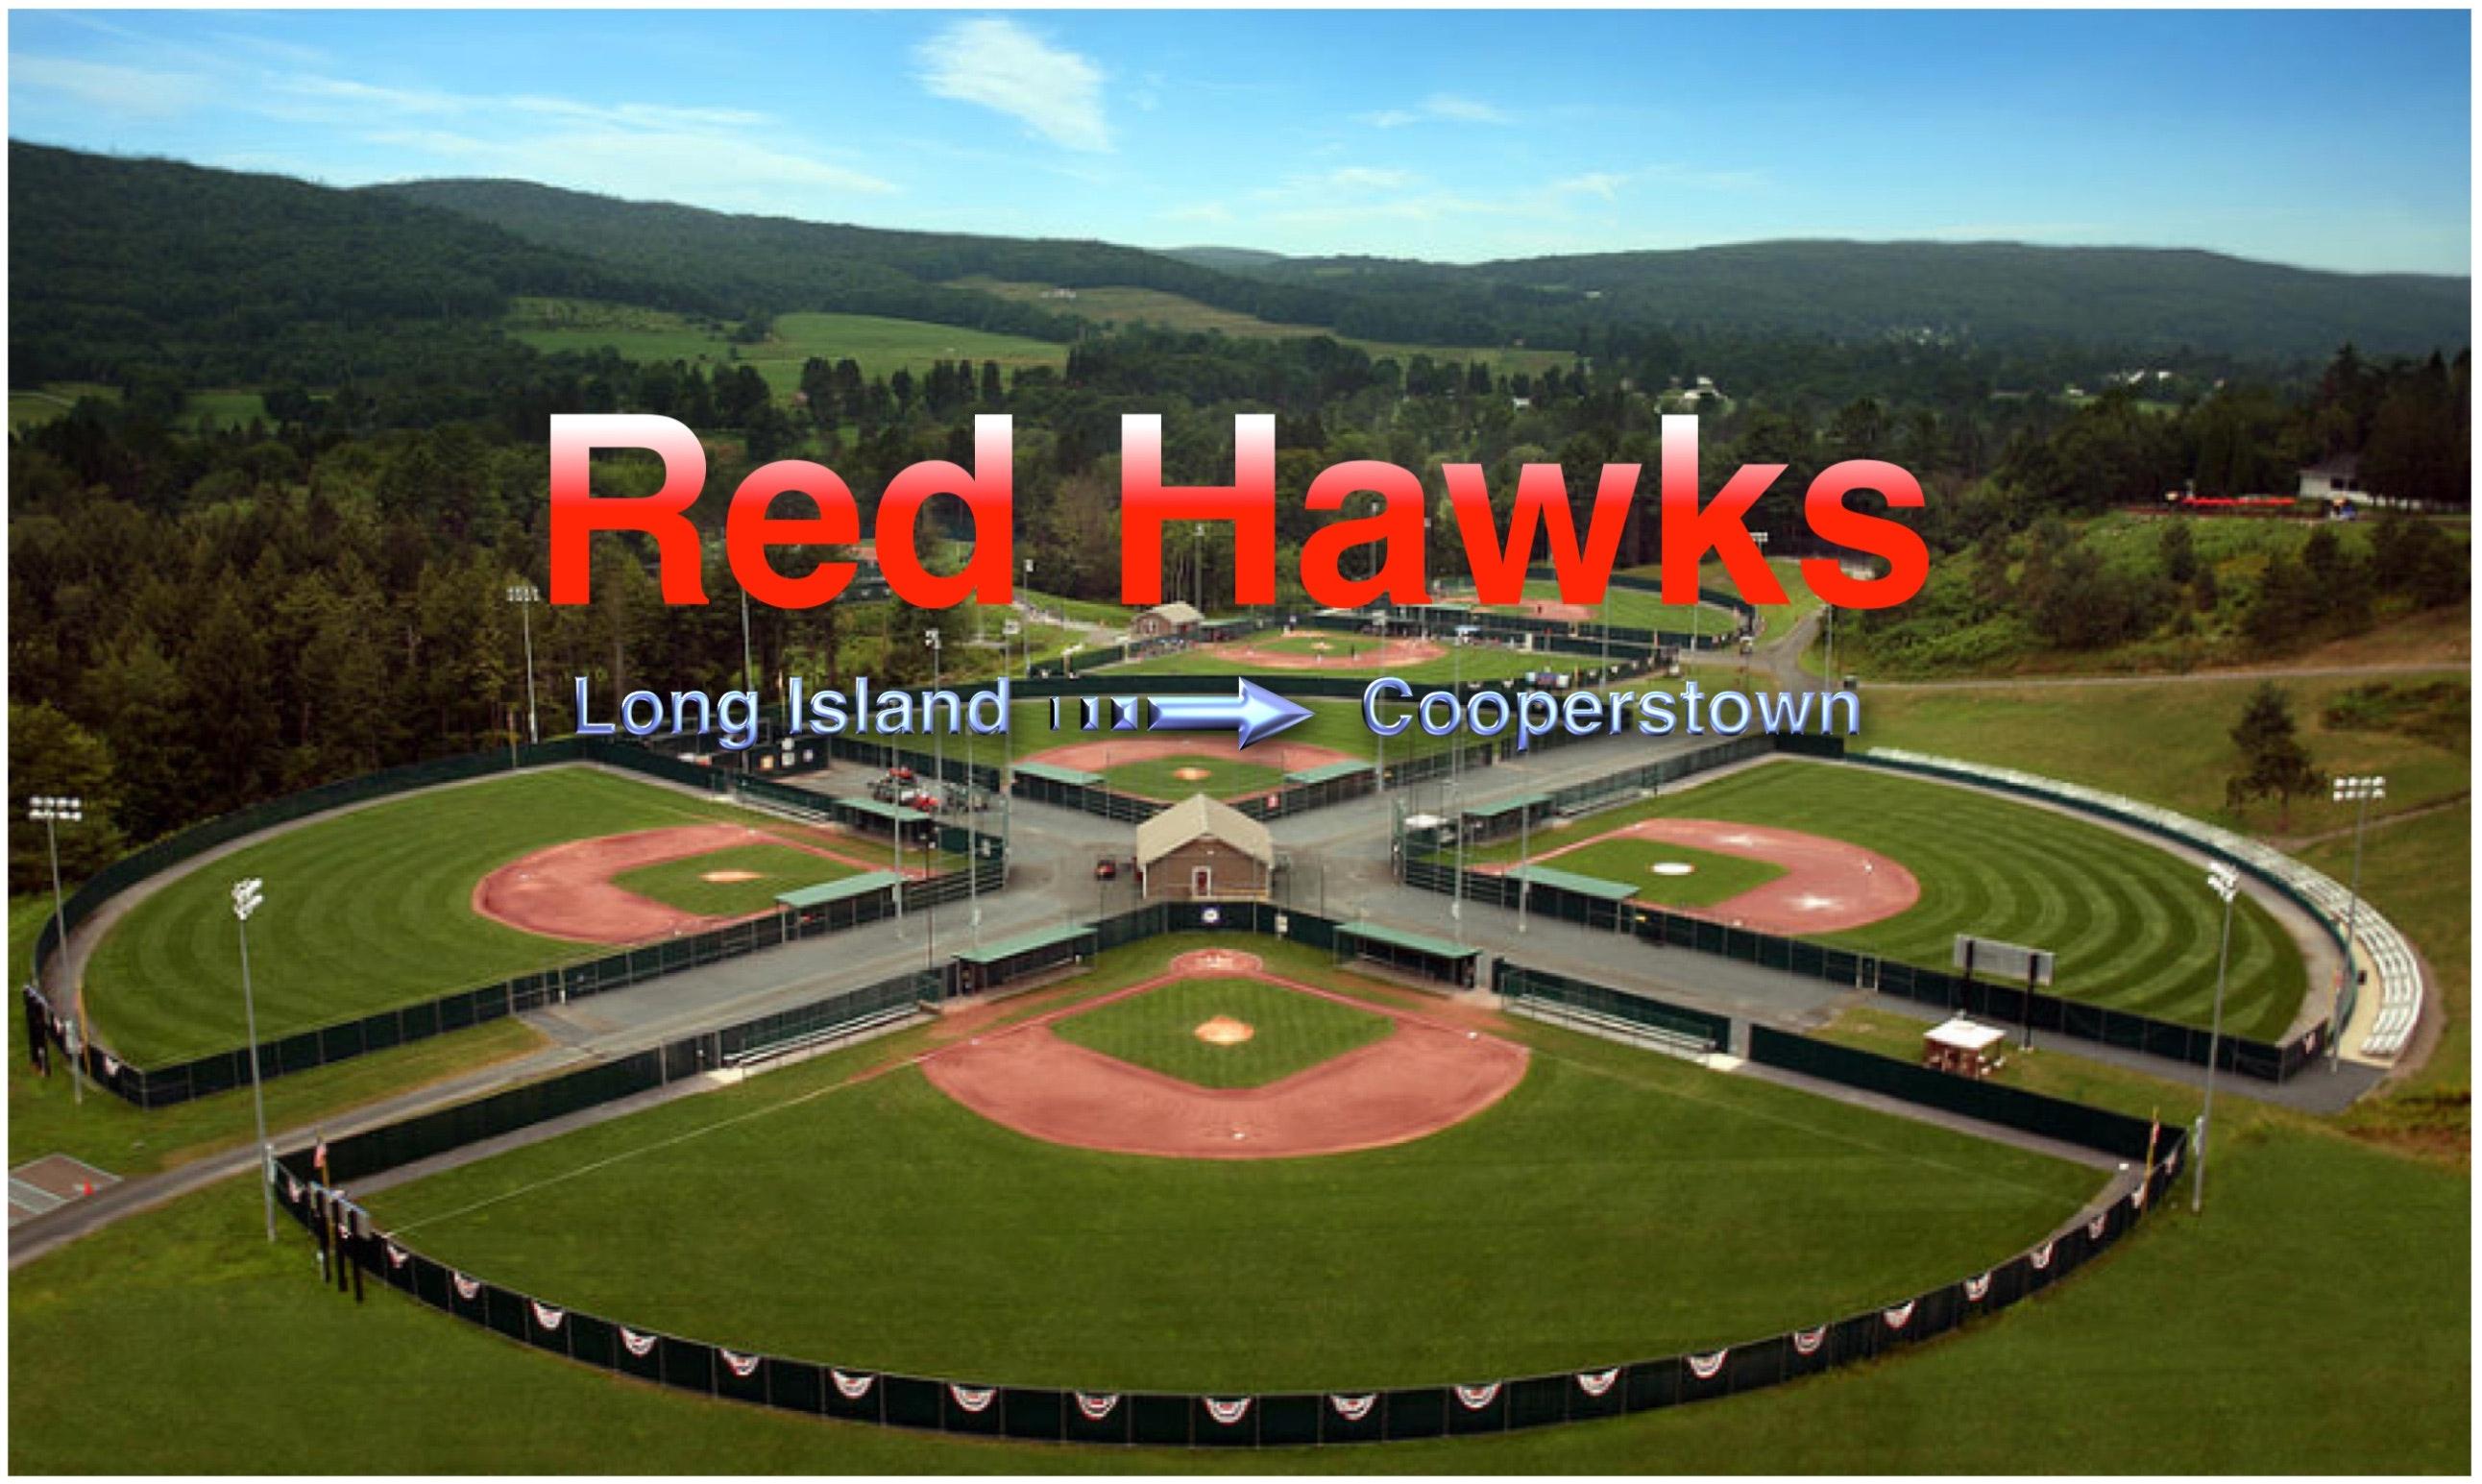 Long Island Red Hawks